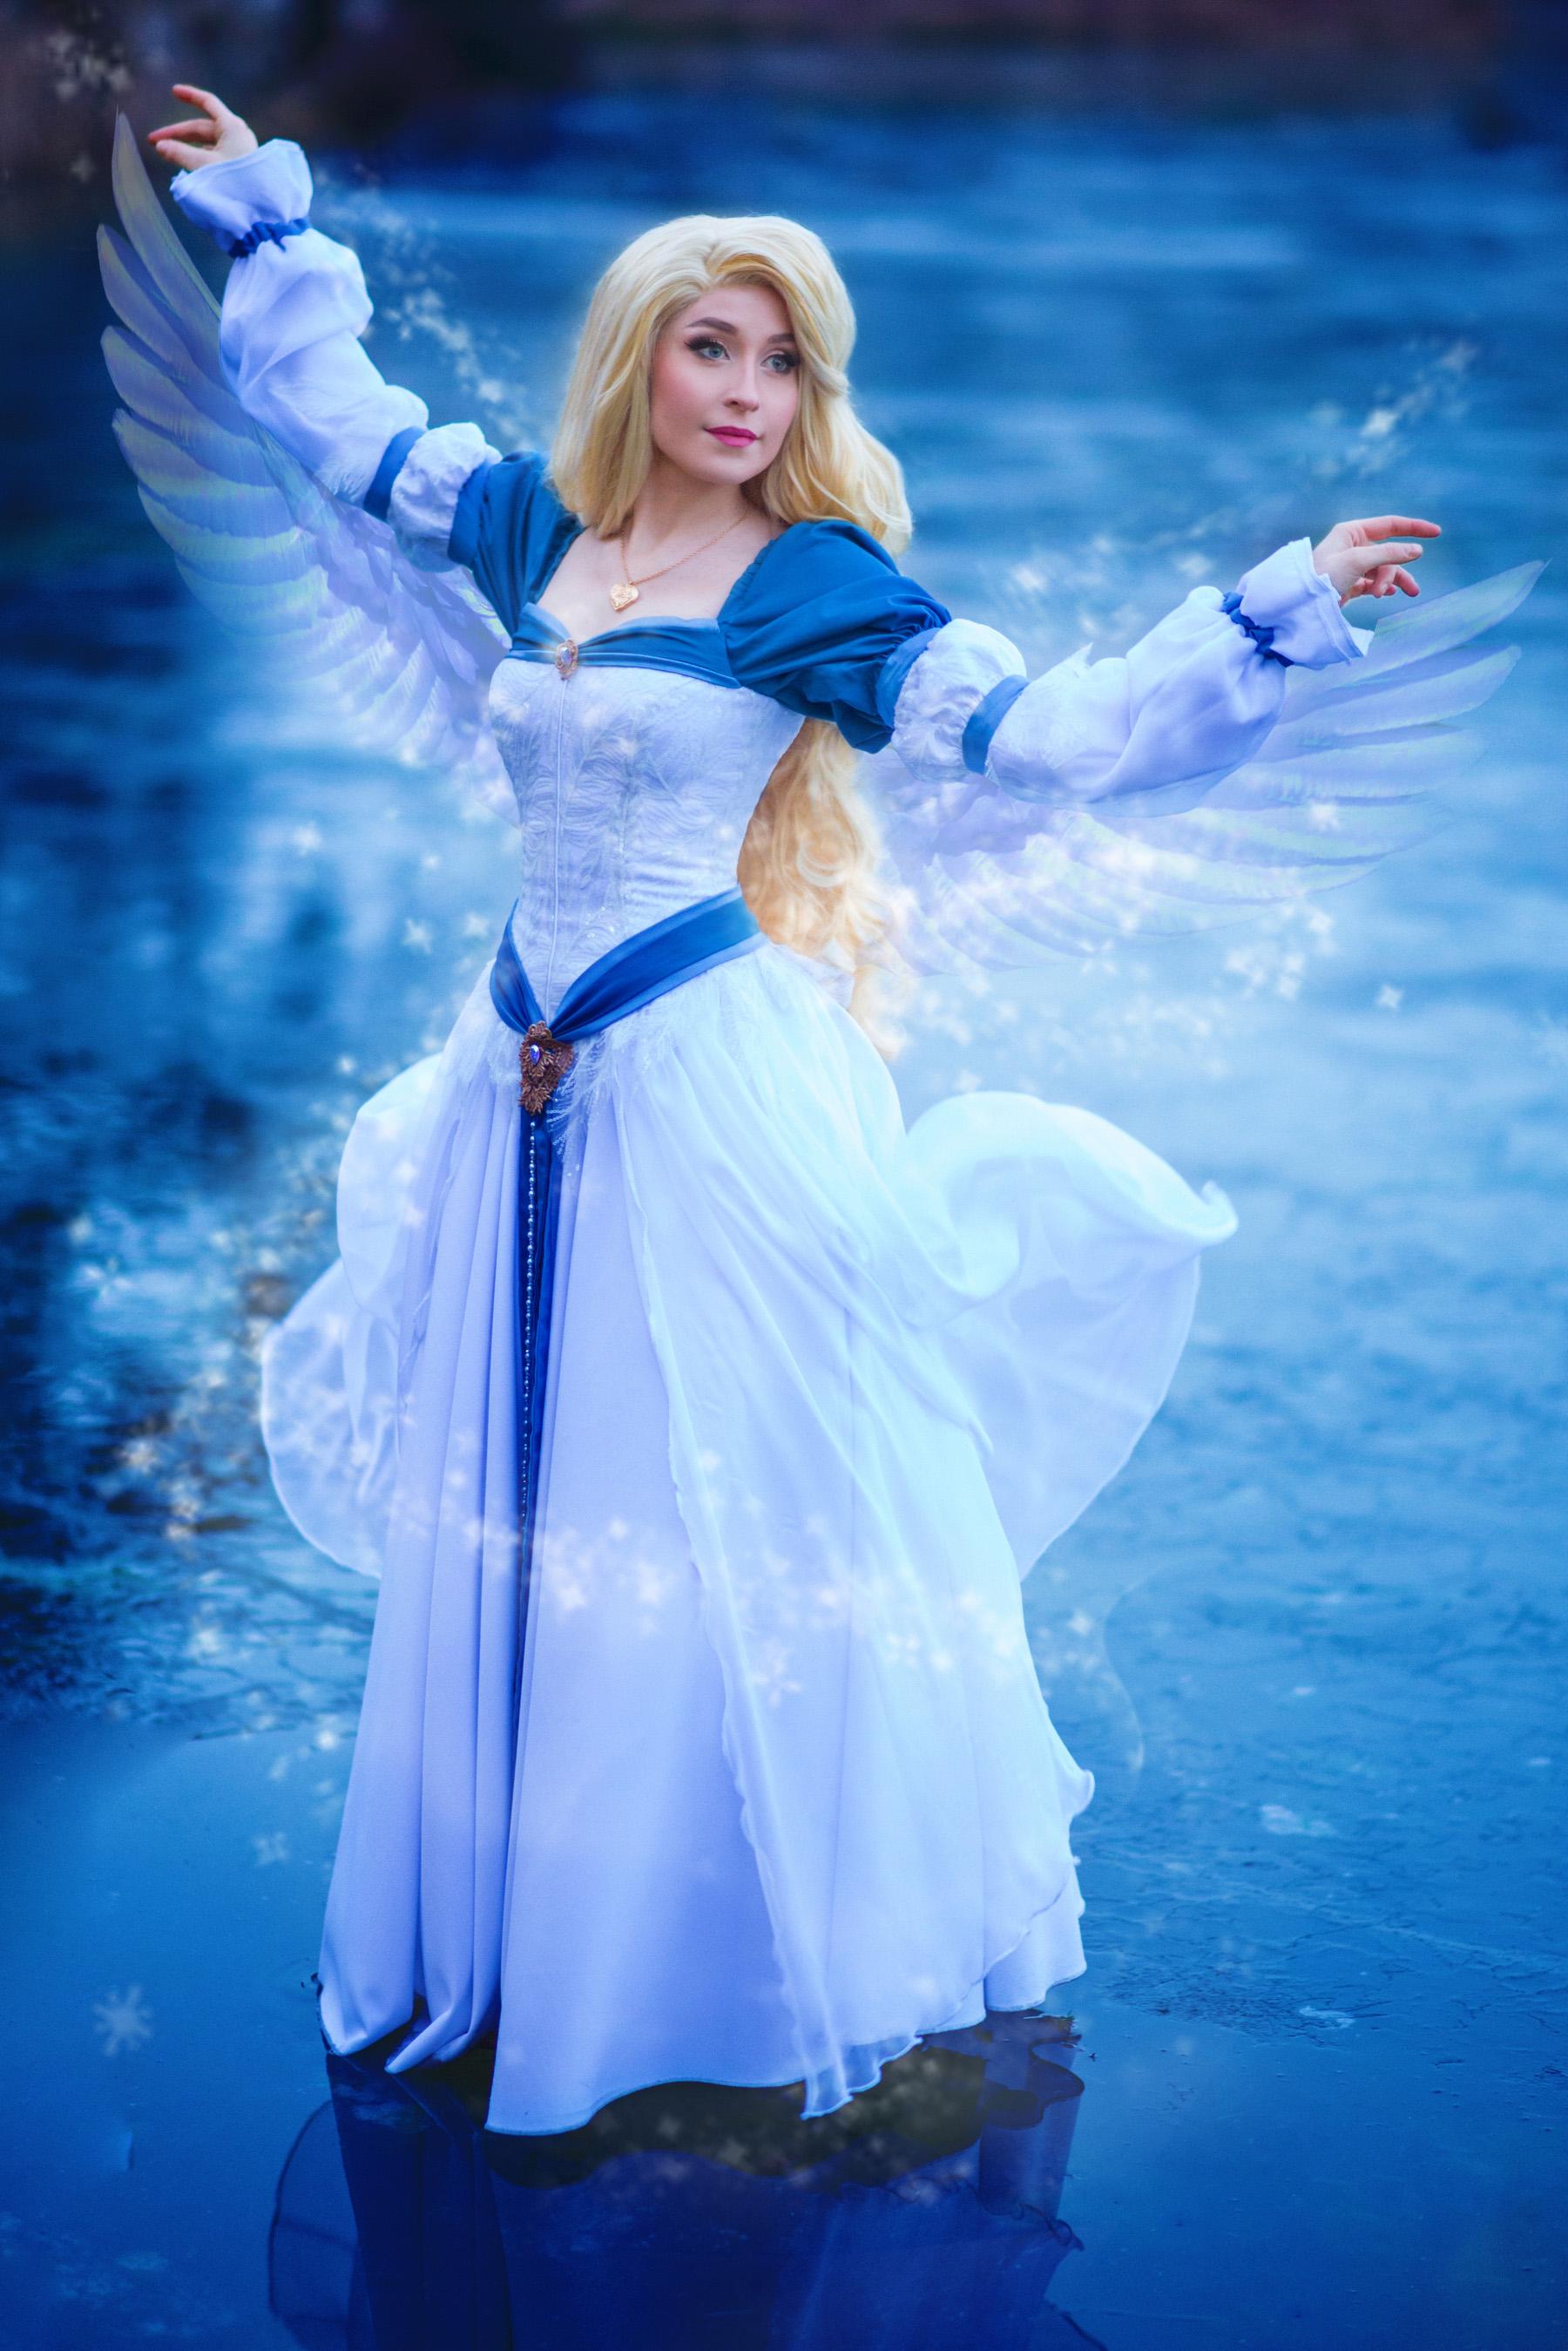 nikita as odette the swan princess nikita cosplay online store